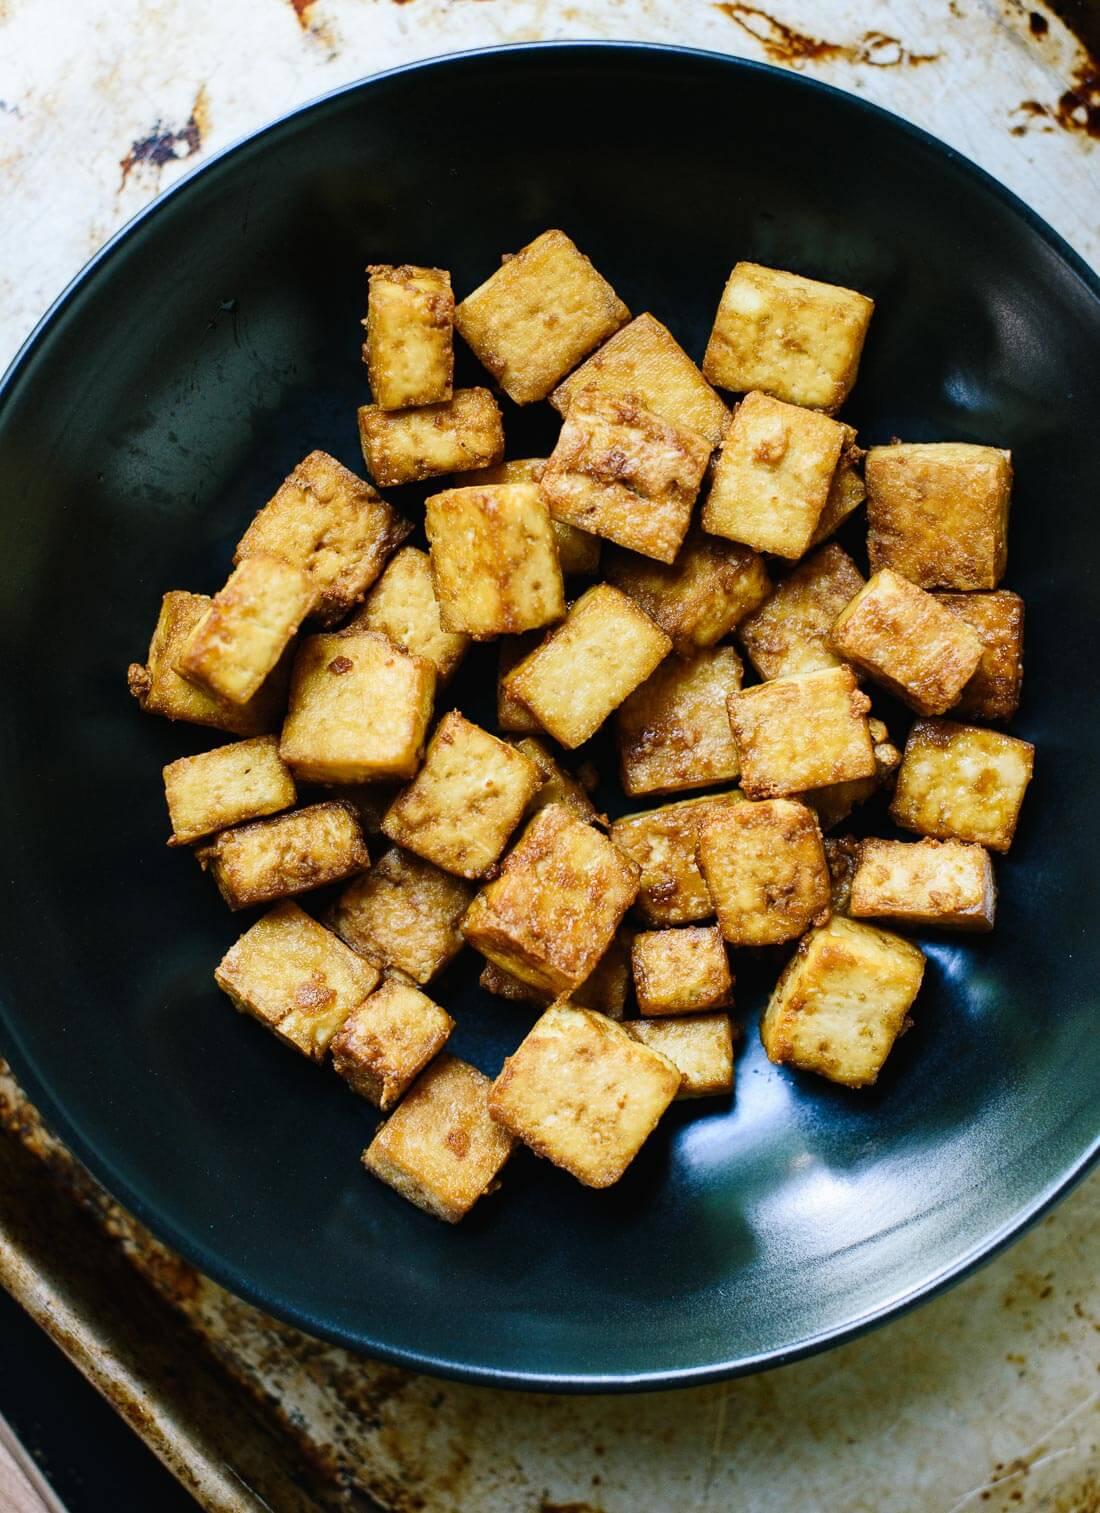 How To Make Crispy Baked Tofu